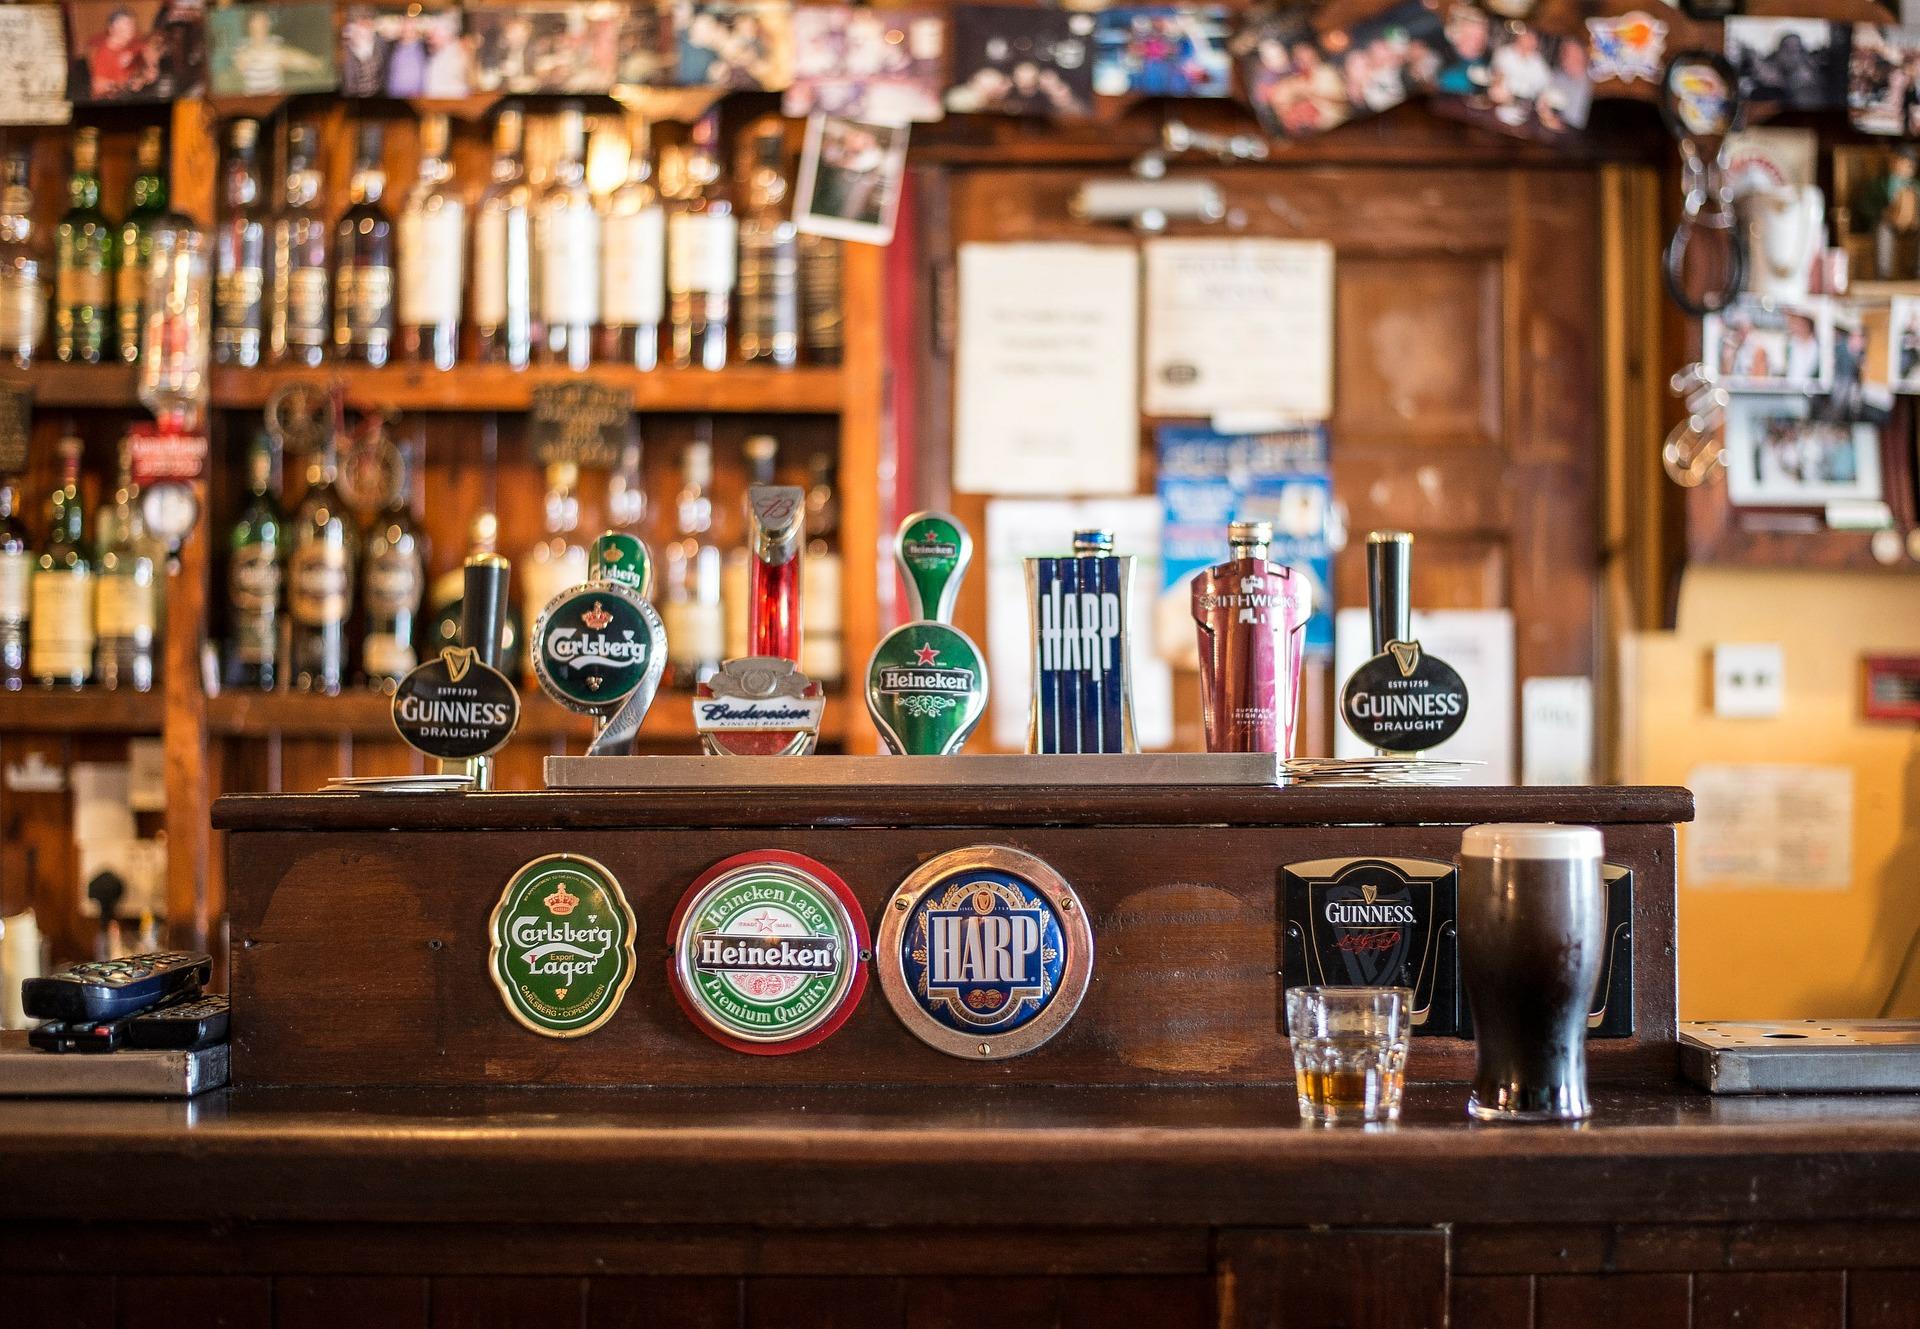 THE SNUG - Irish Pub - KAISERSLAUTERN   The Snug - Irish-Pub